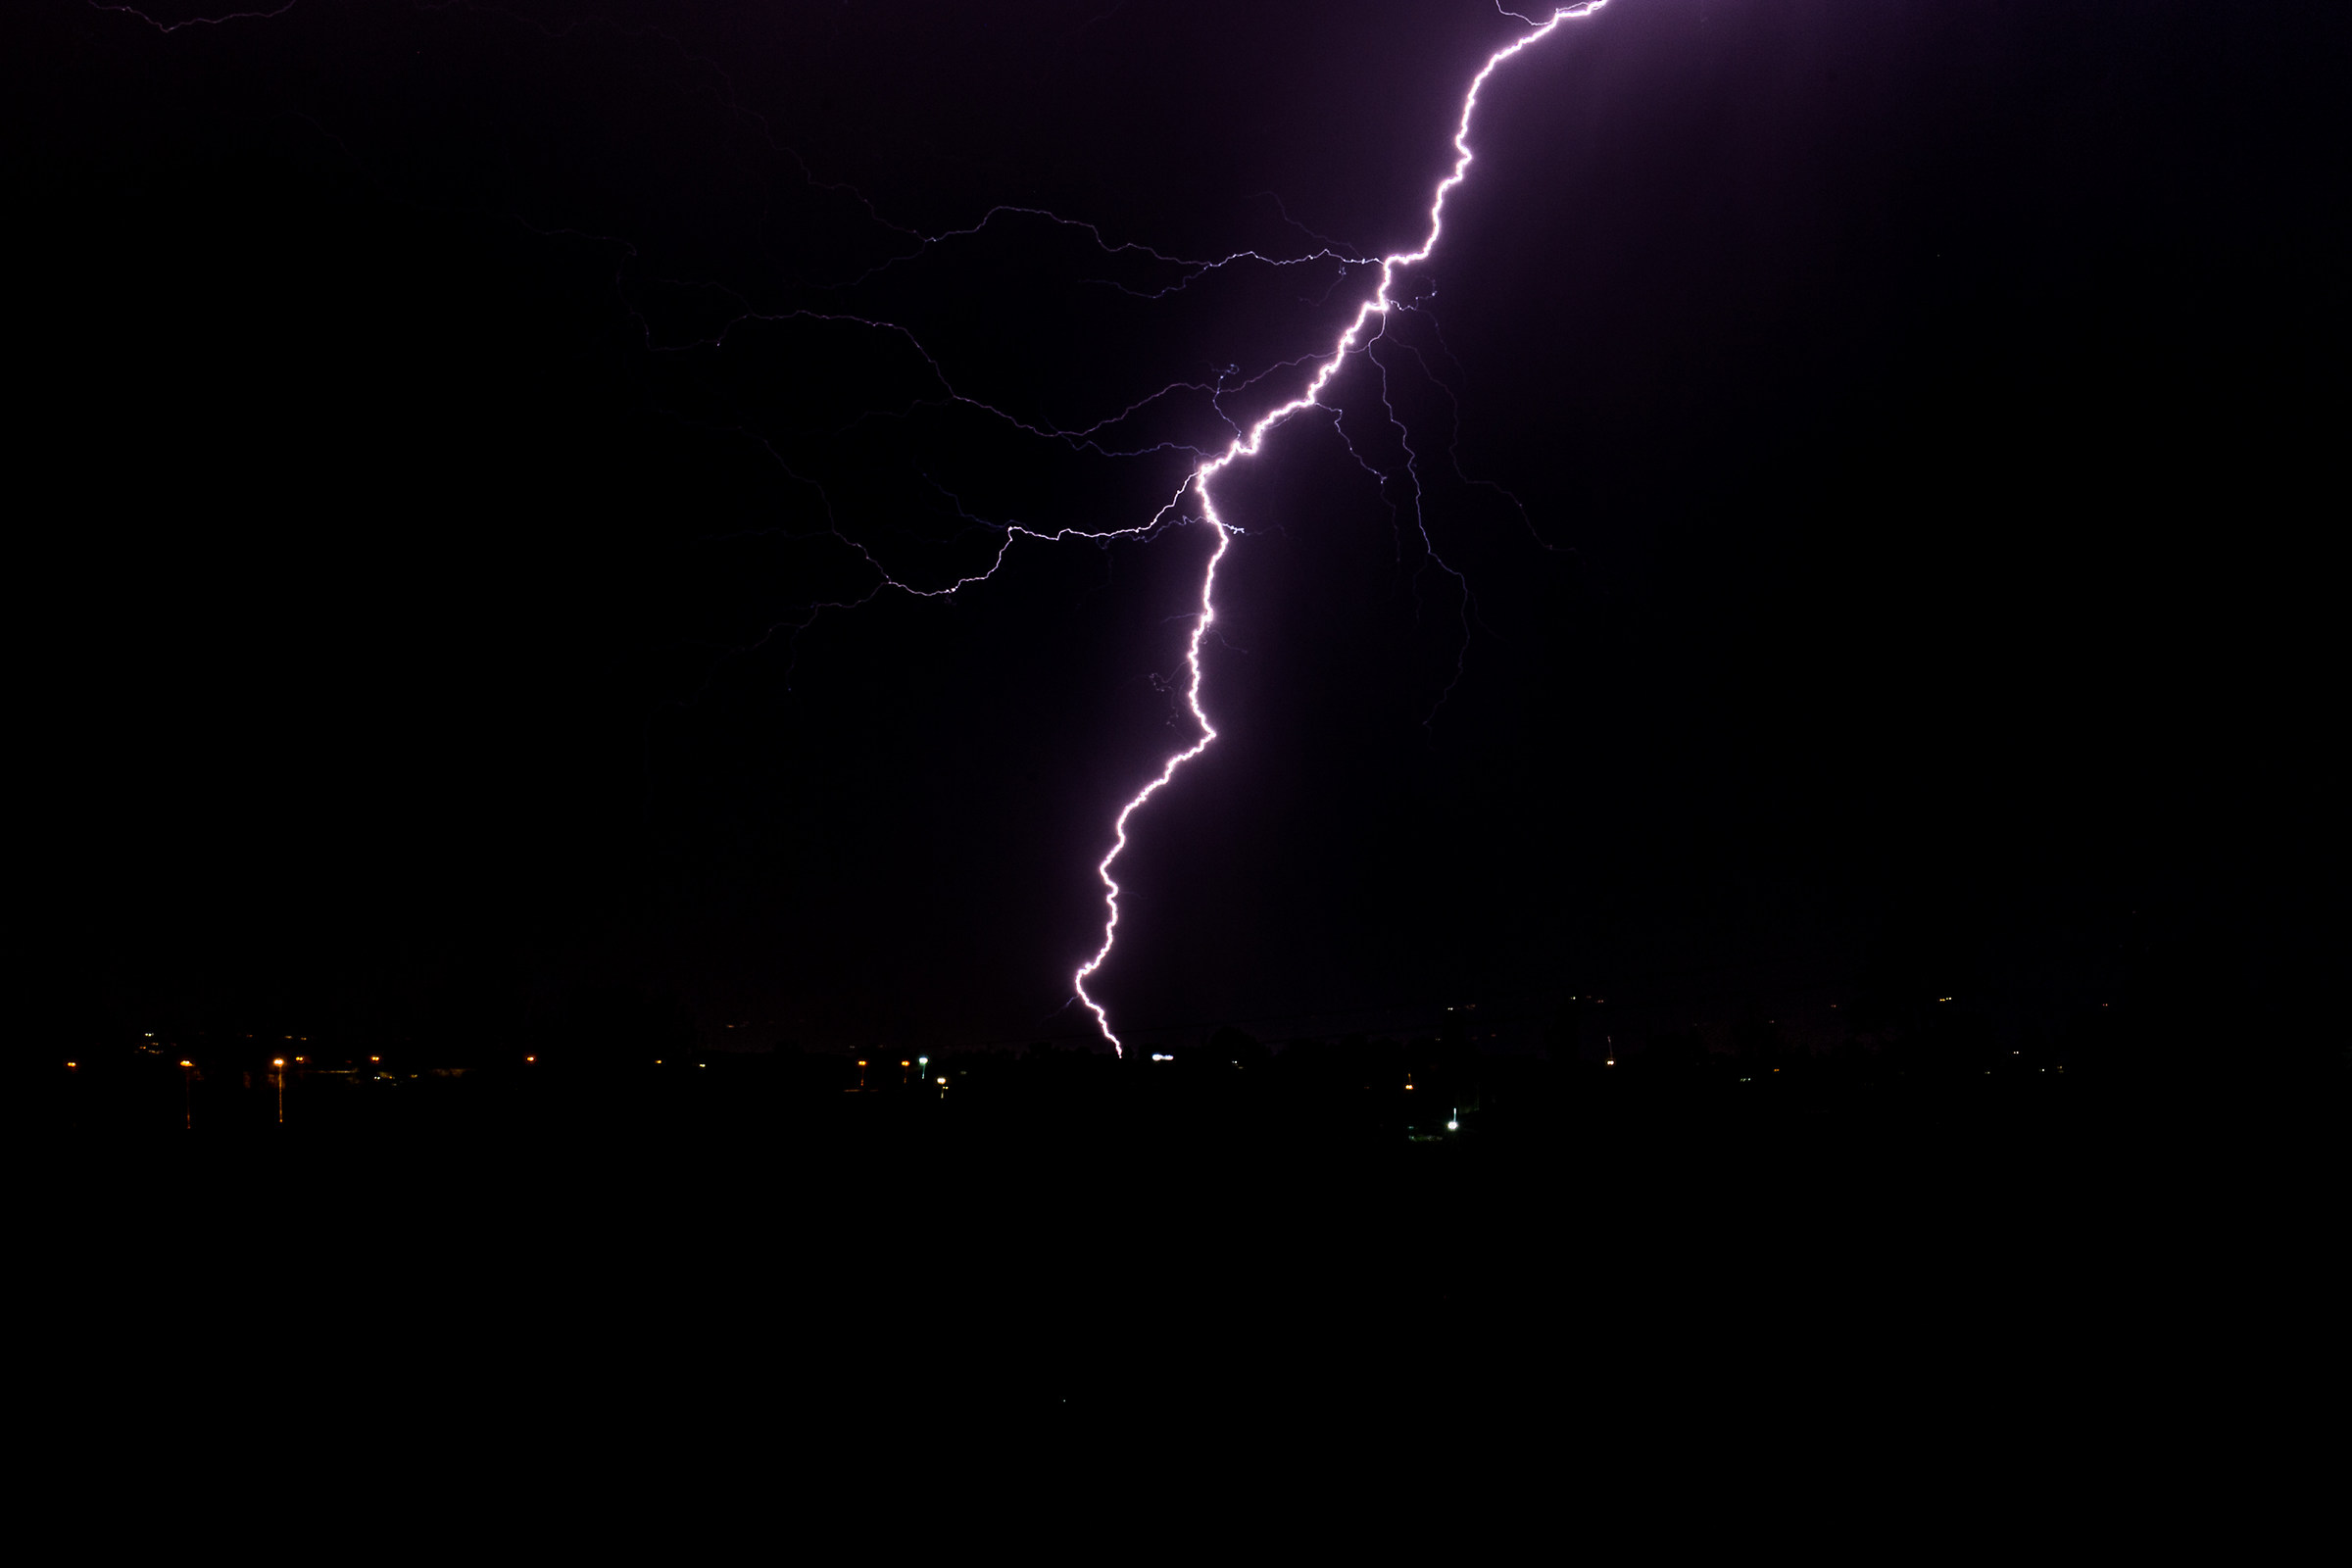 Lightning 1 (on the ground)...